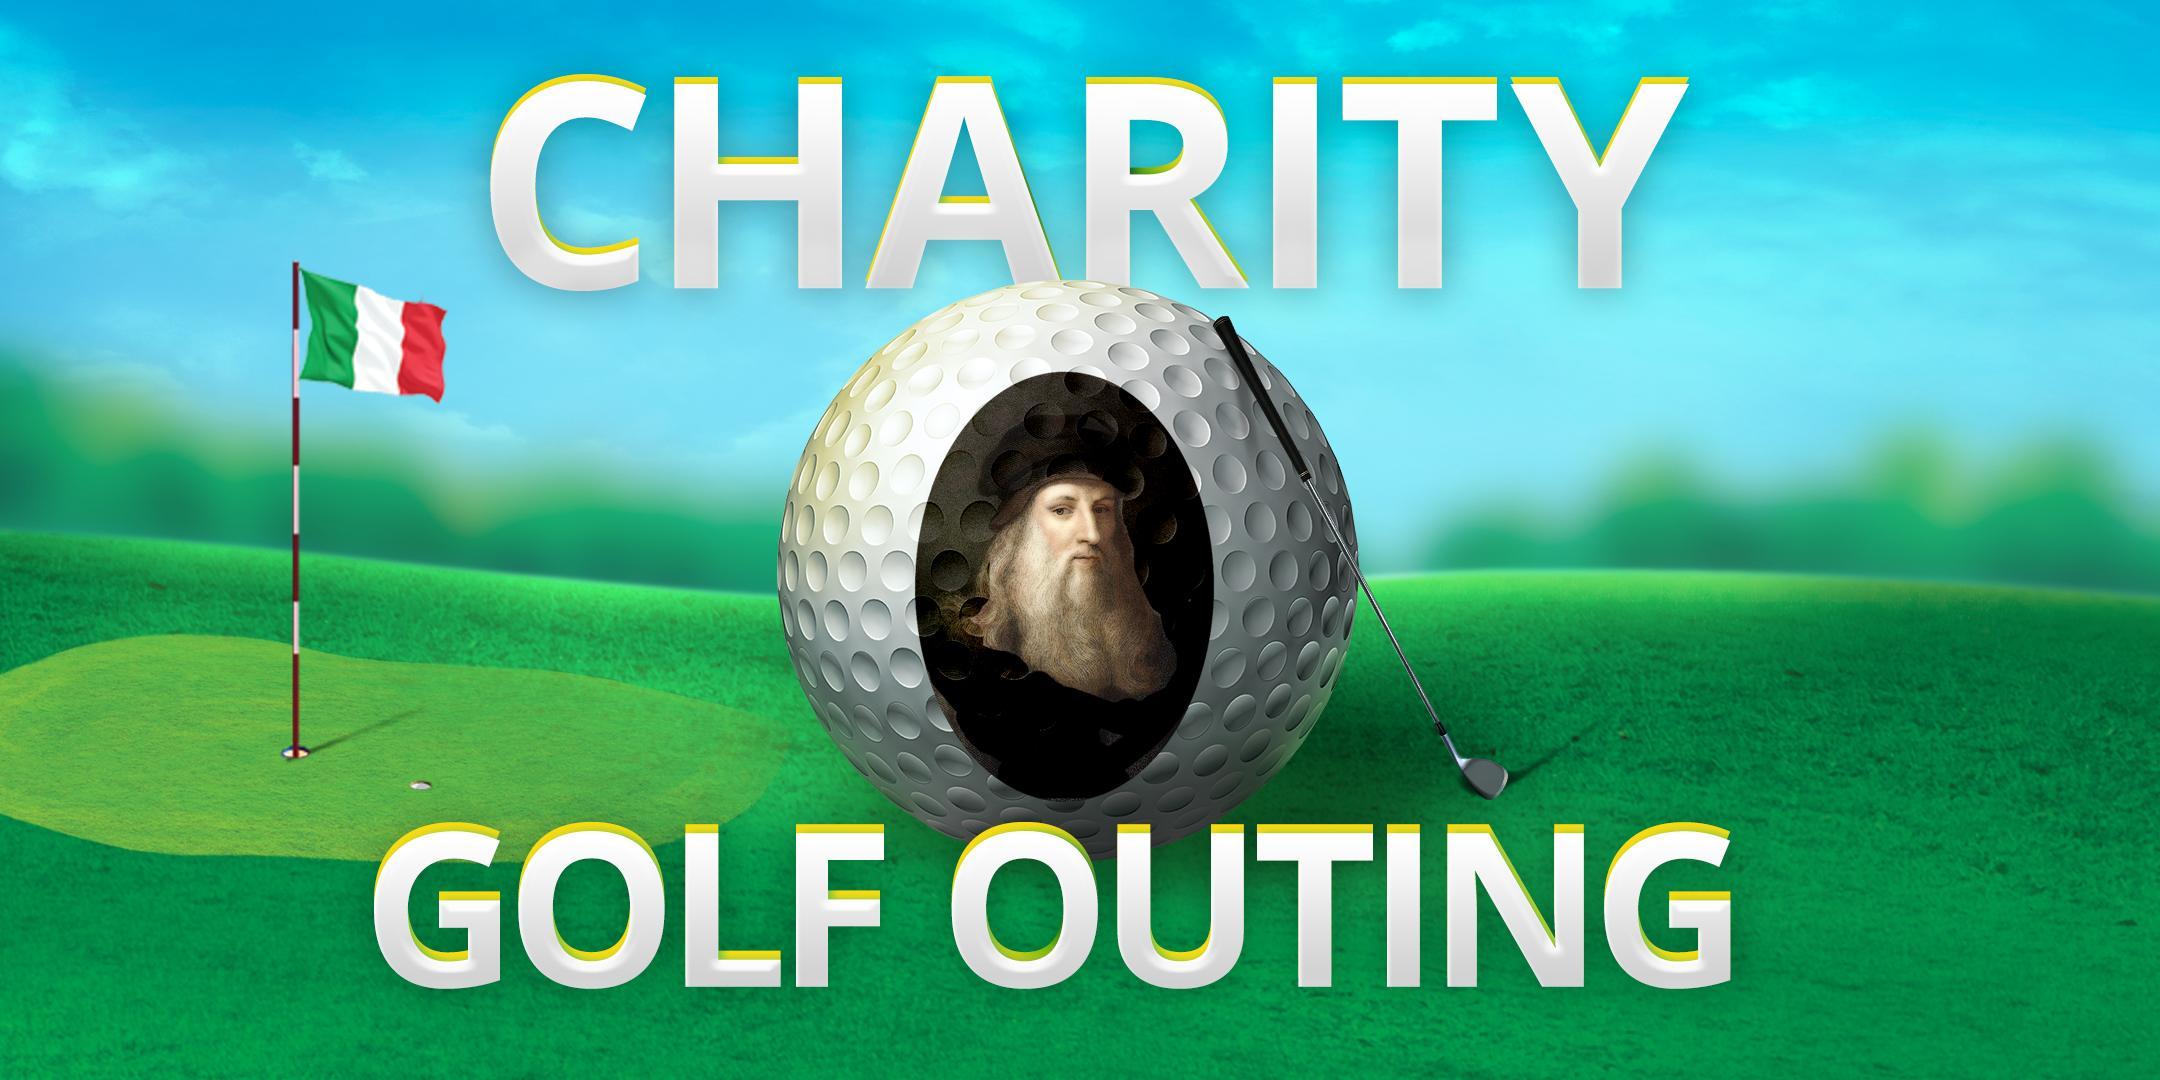 Da Vinci Charity Golf Outing